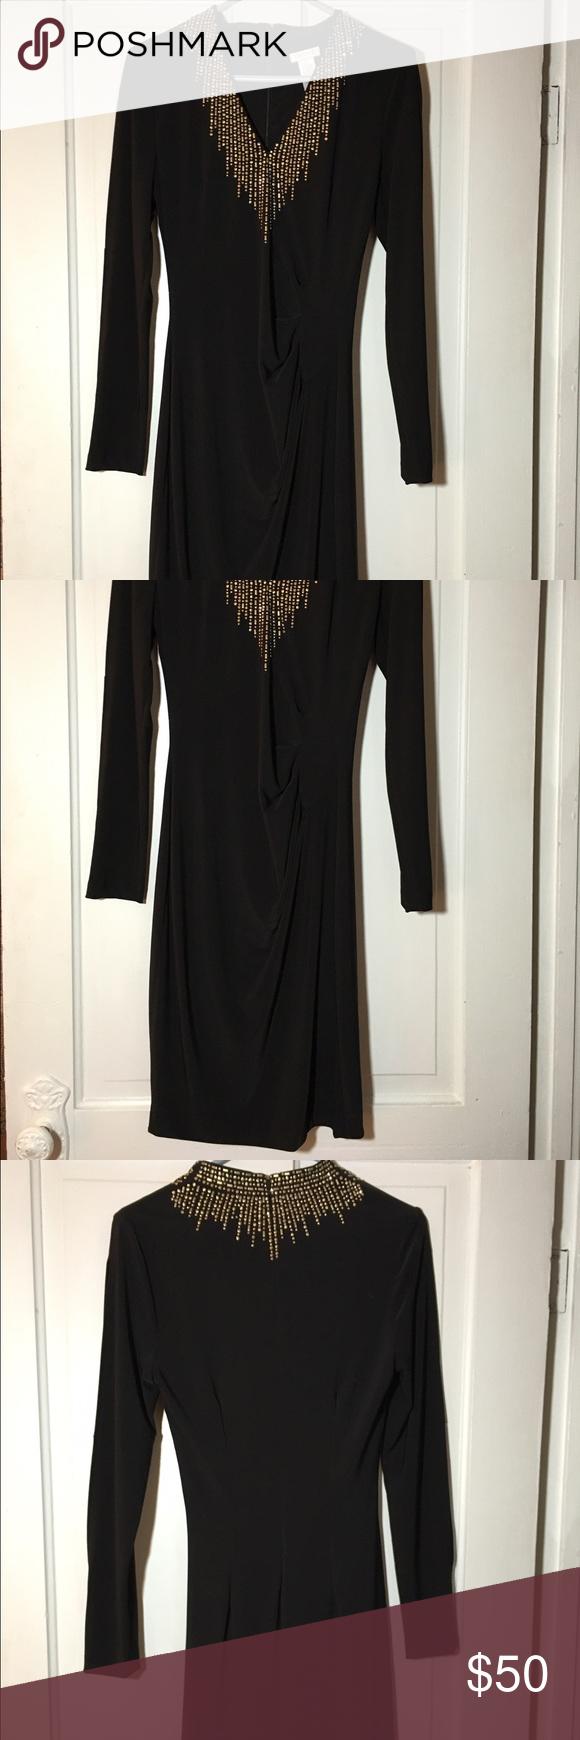 Cache Black Dress Golden Accents Size 6 Black Dress With Sleeves Clothes Design Dresses [ 1740 x 580 Pixel ]